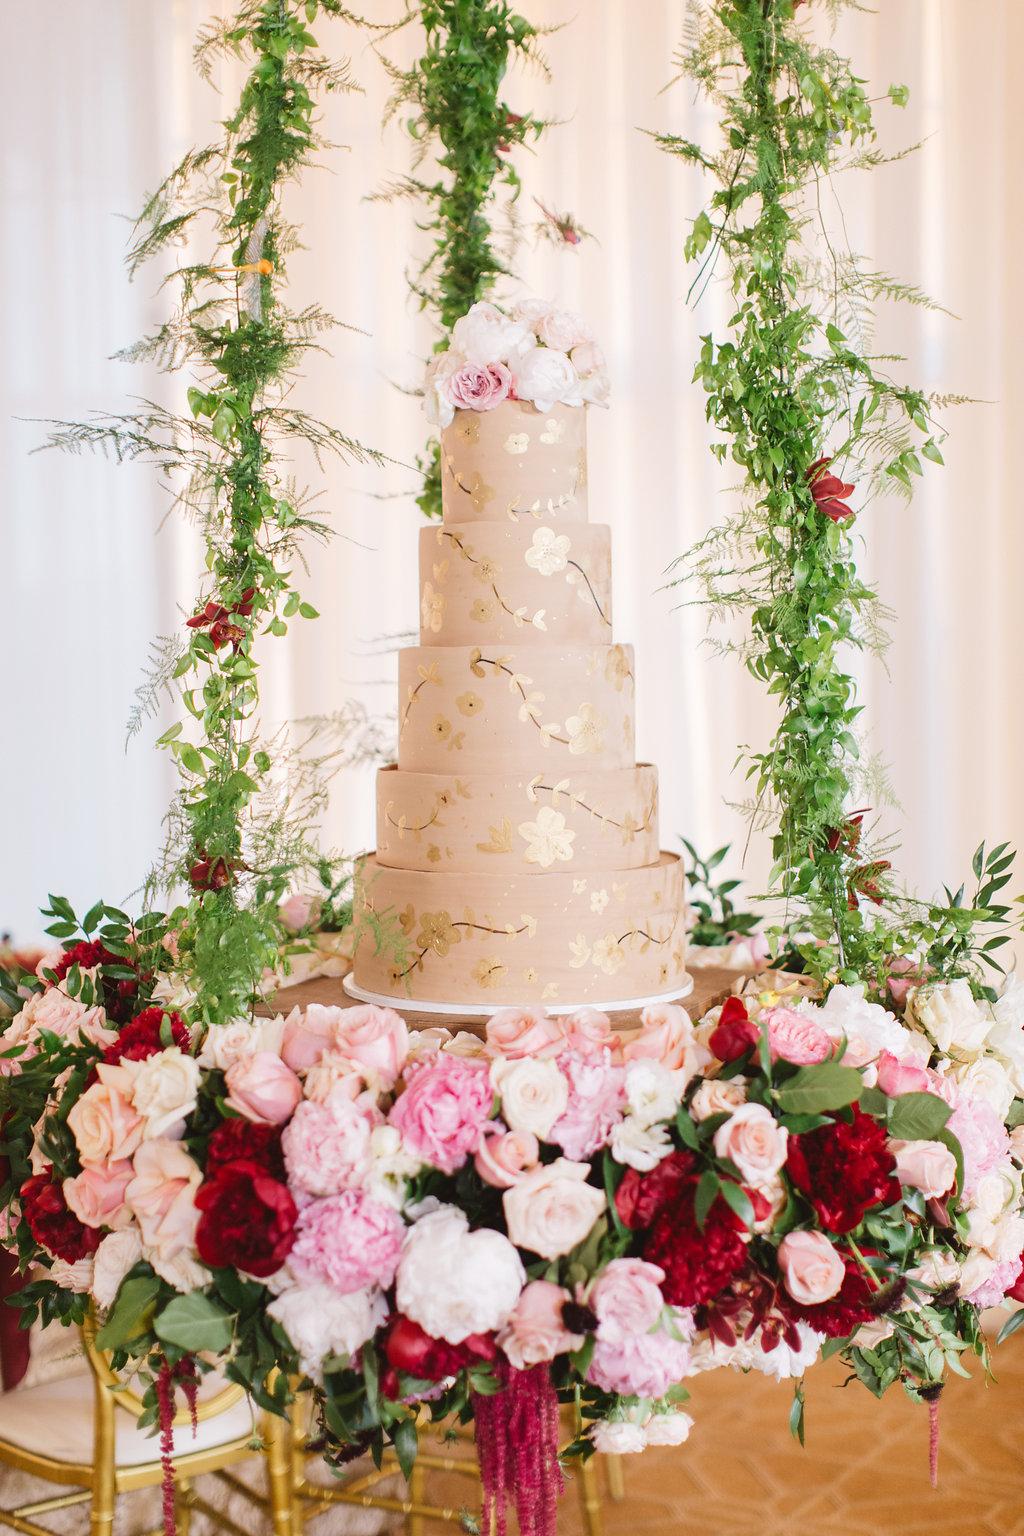 Cherry blossom wedding cake with gold details wedding cake ideas